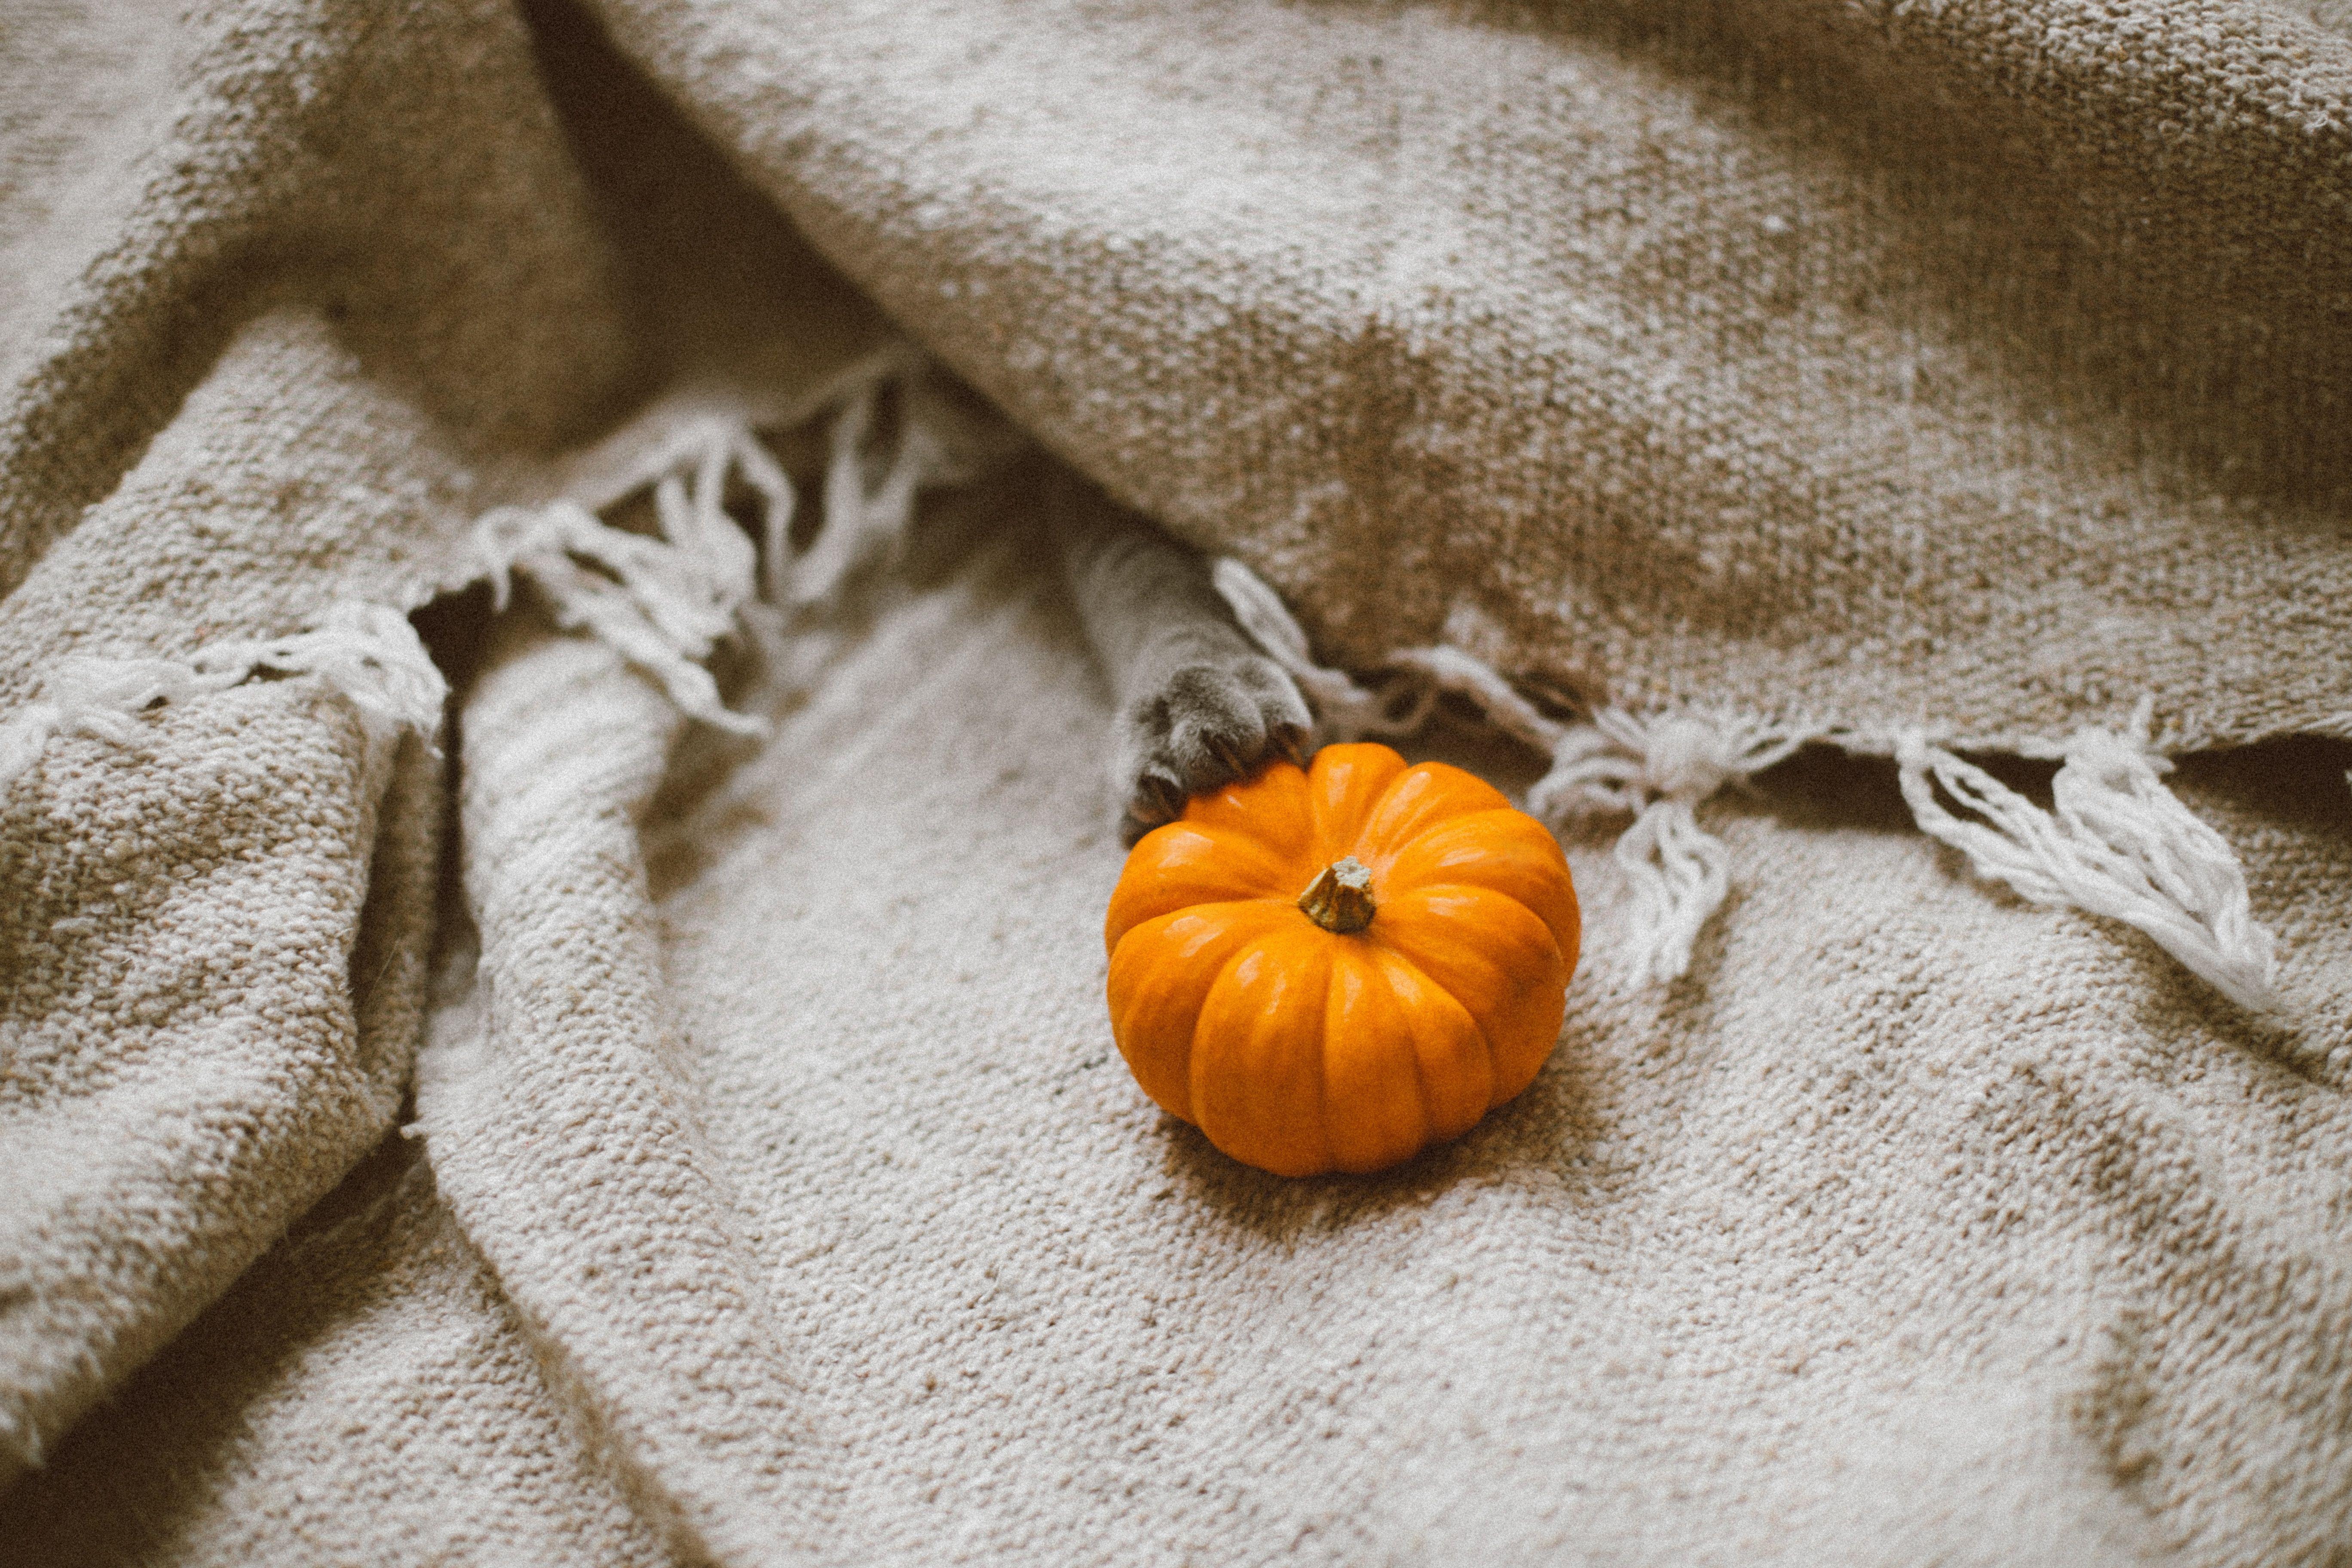 Pumpkin on a blanket